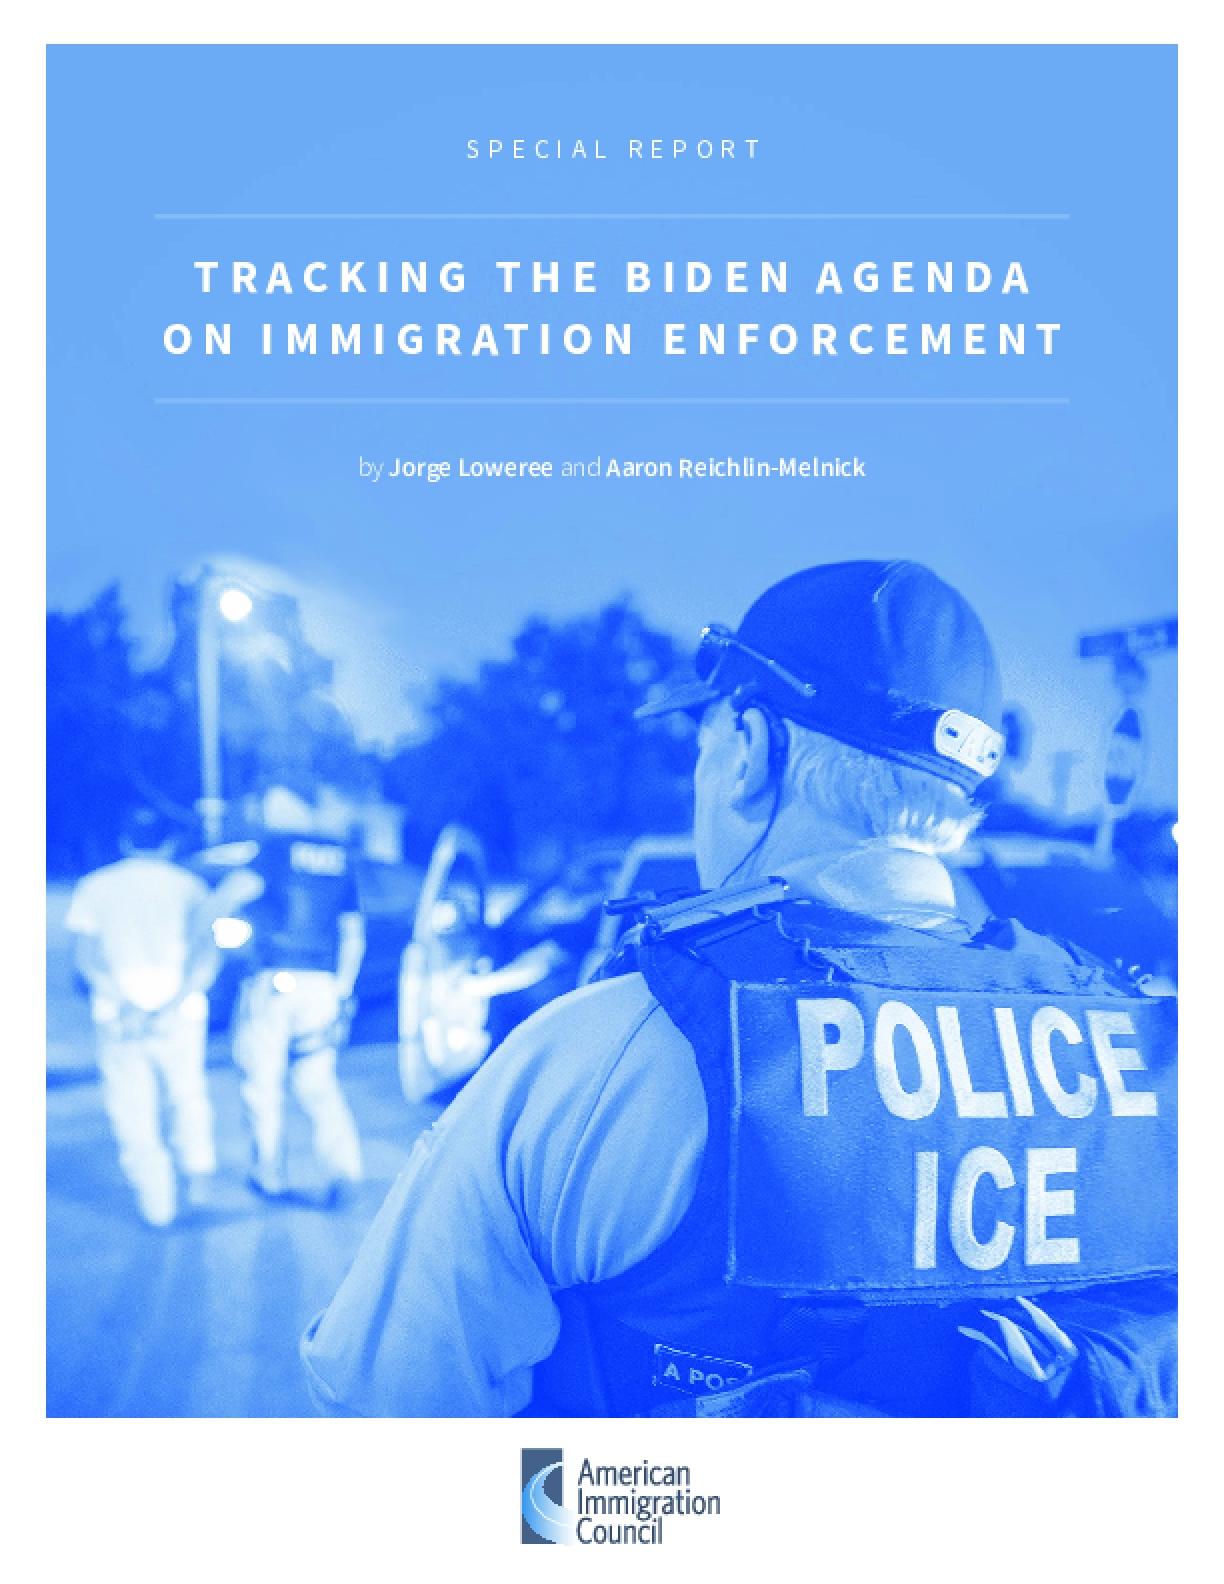 Tracking the Biden Agenda on Immigration Enforcement